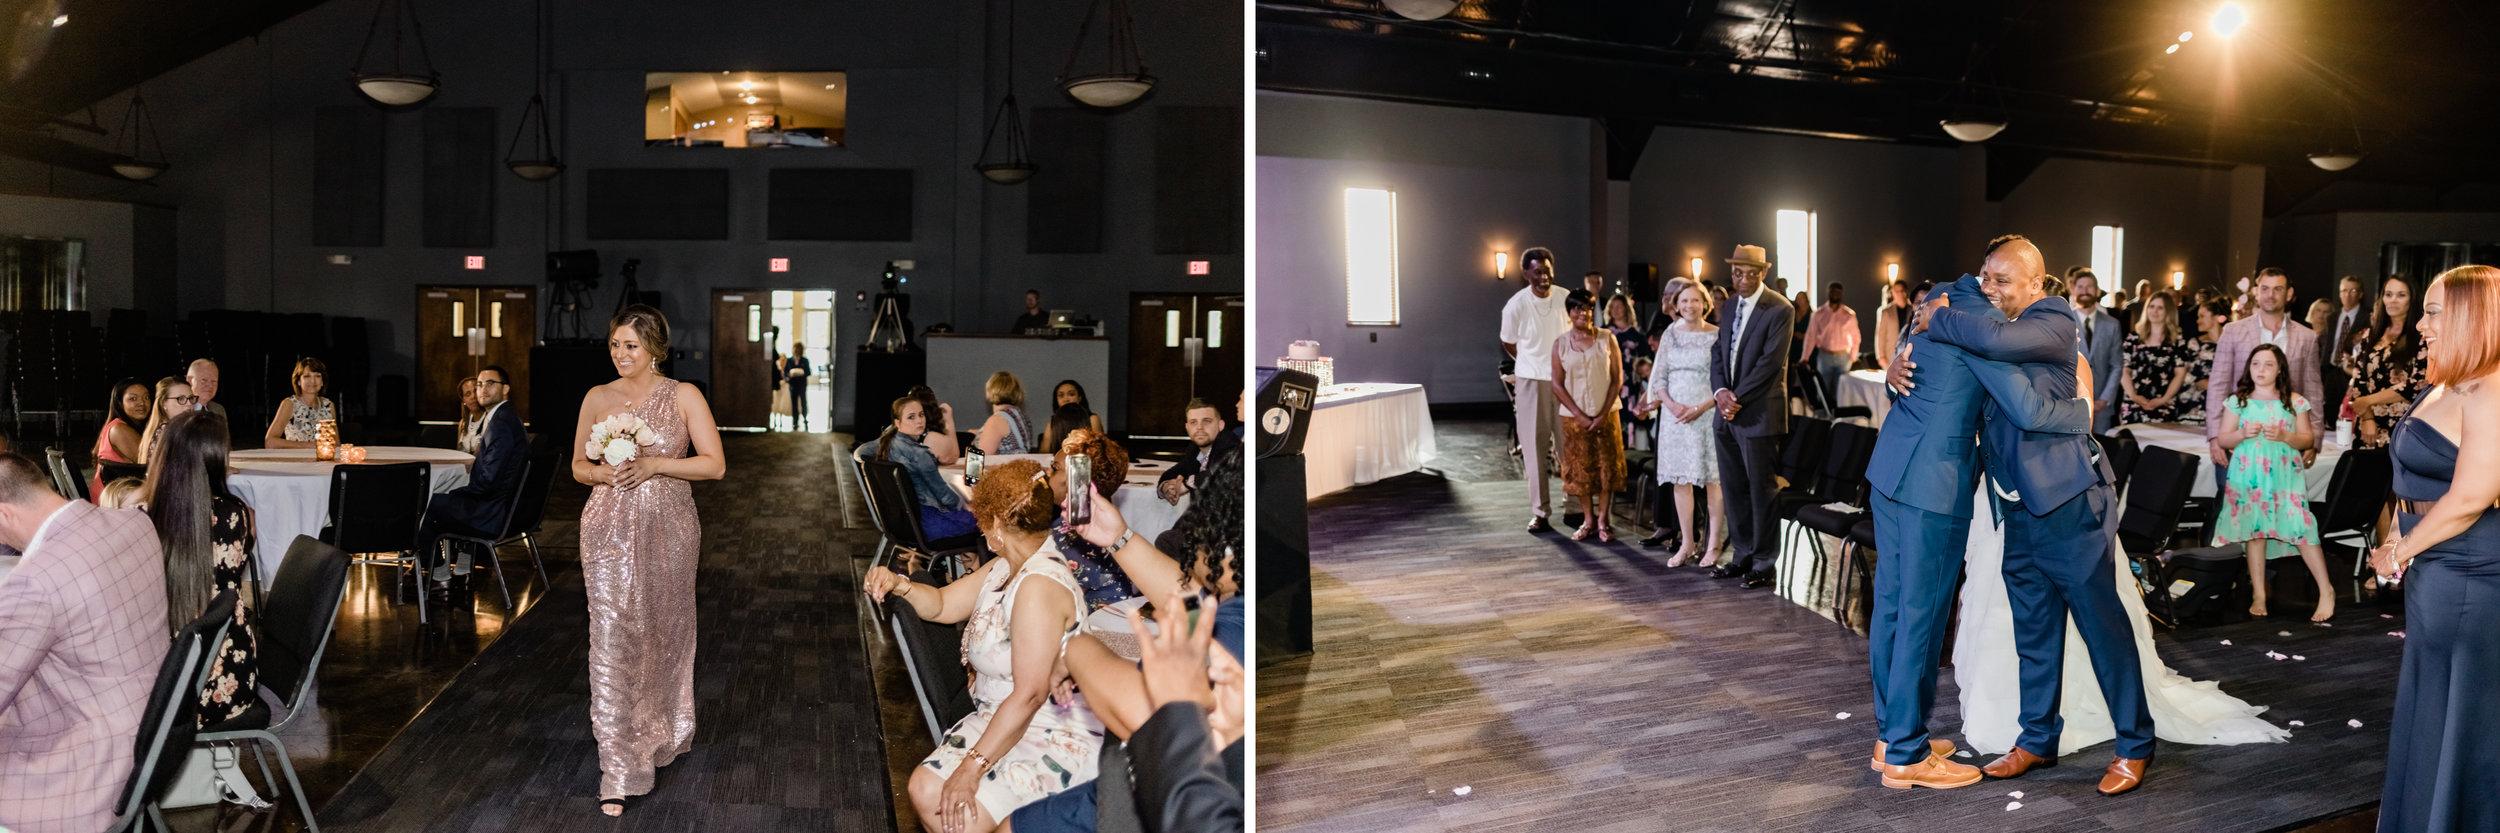 Kansas City Wedding Photographer 63.jpg